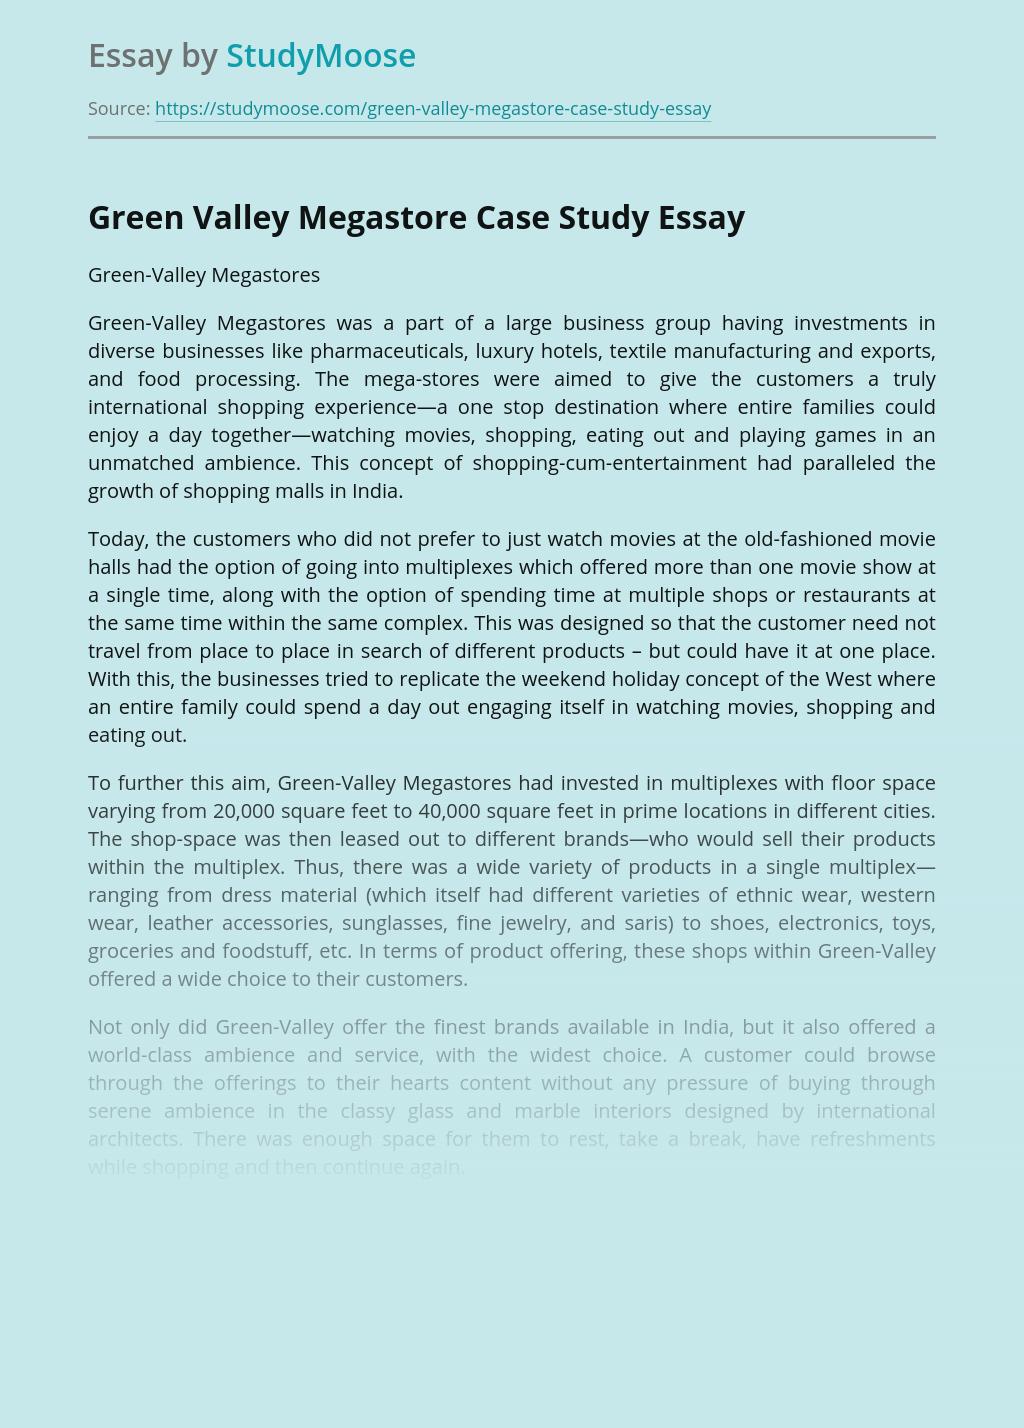 Green Valley Megastore Case Study